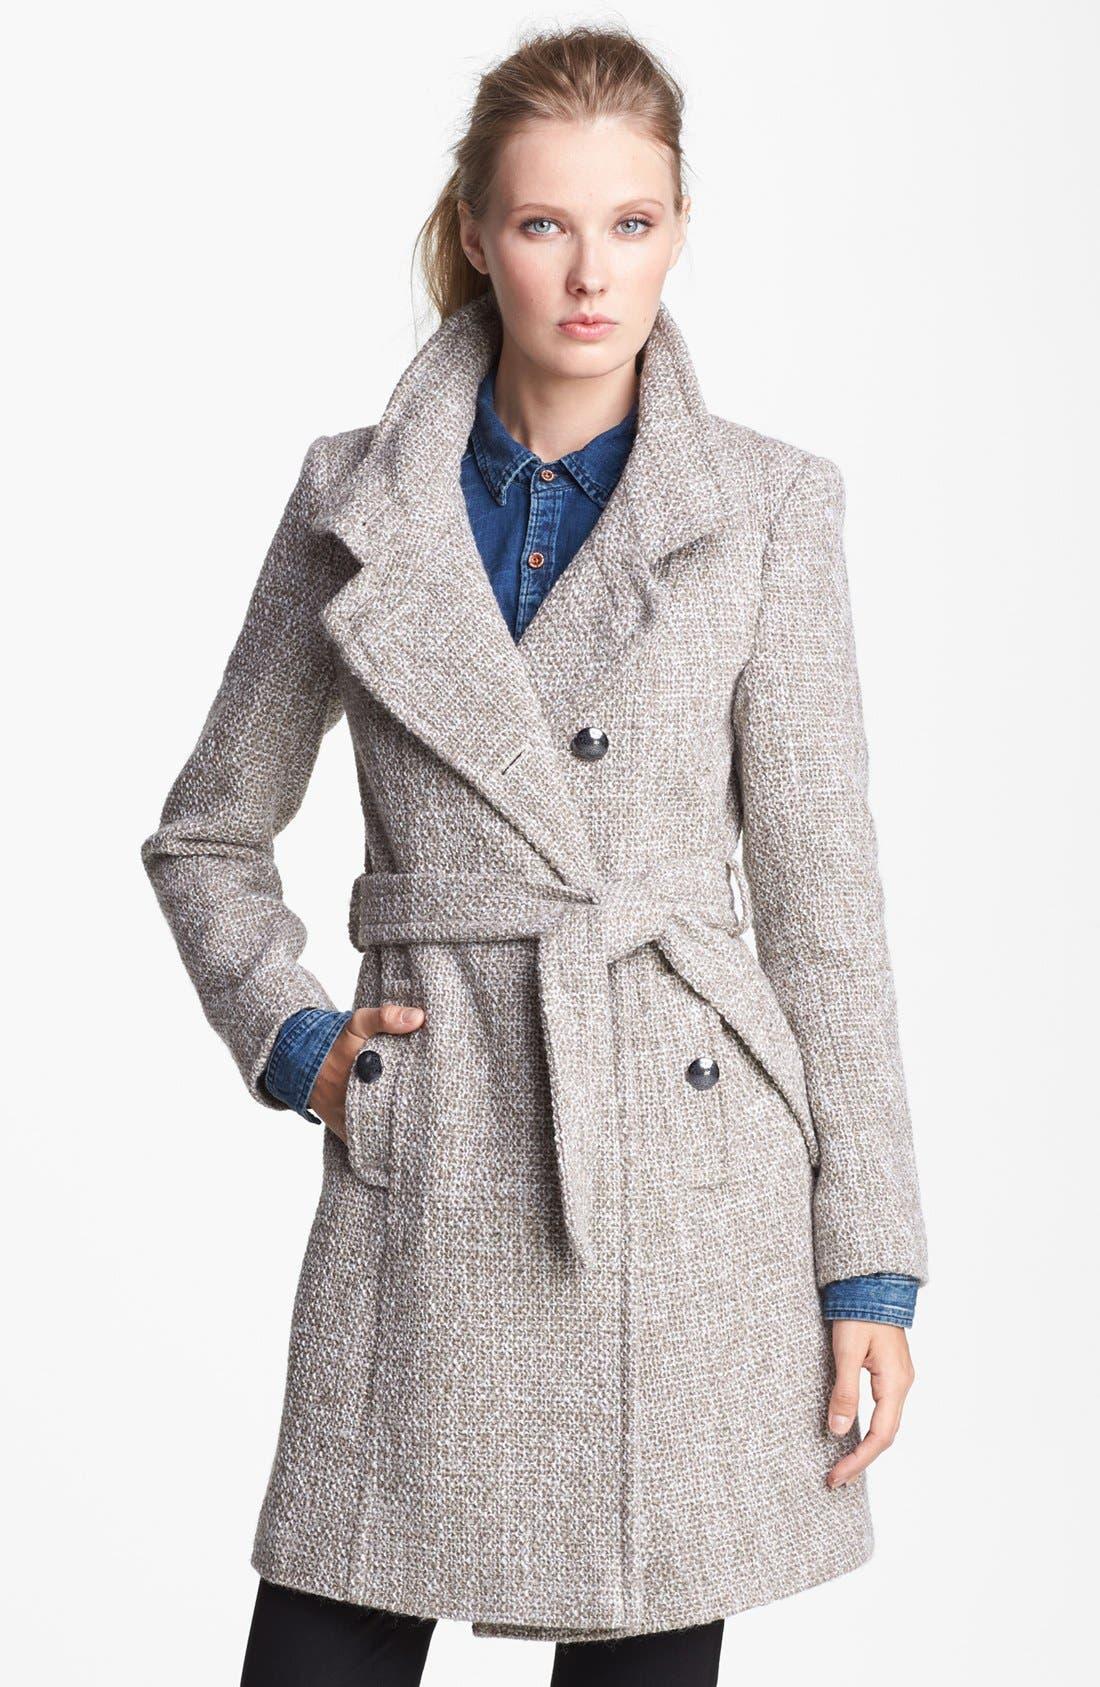 T TAHARI, 'Izzy' Belted Tweed Coat, Main thumbnail 1, color, 200